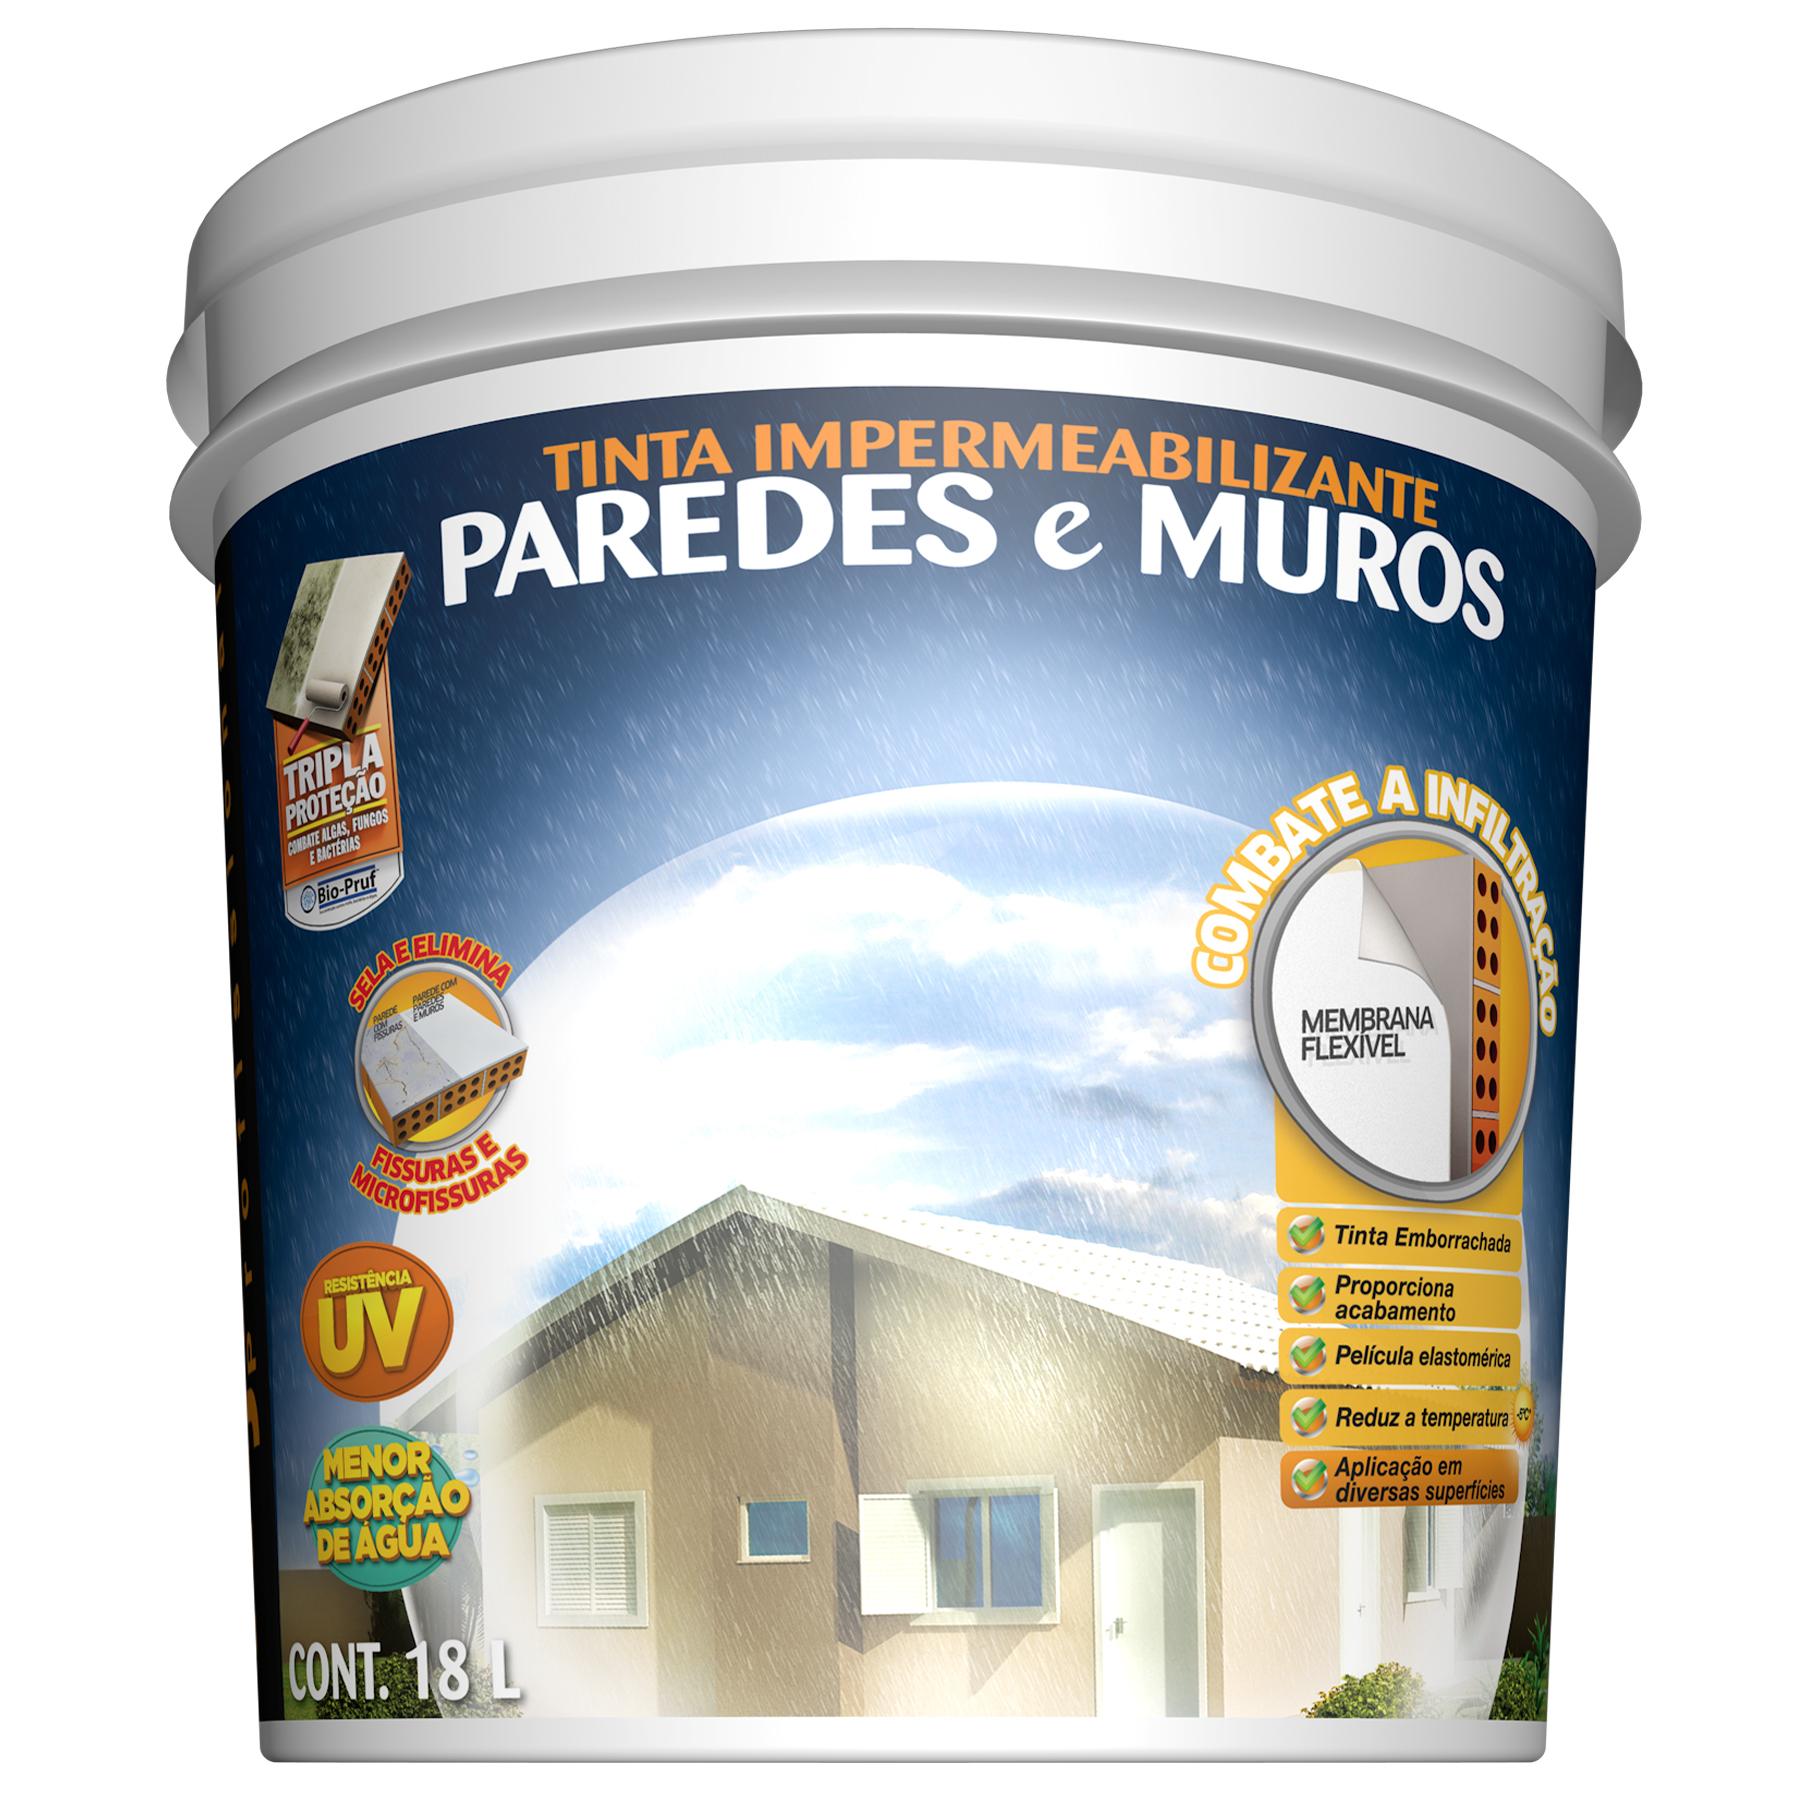 Tinta impermeabilizante paredes e muros 18l verde amaz nia hydronorth leroy merlin - Impermeabilizante para paredes ...